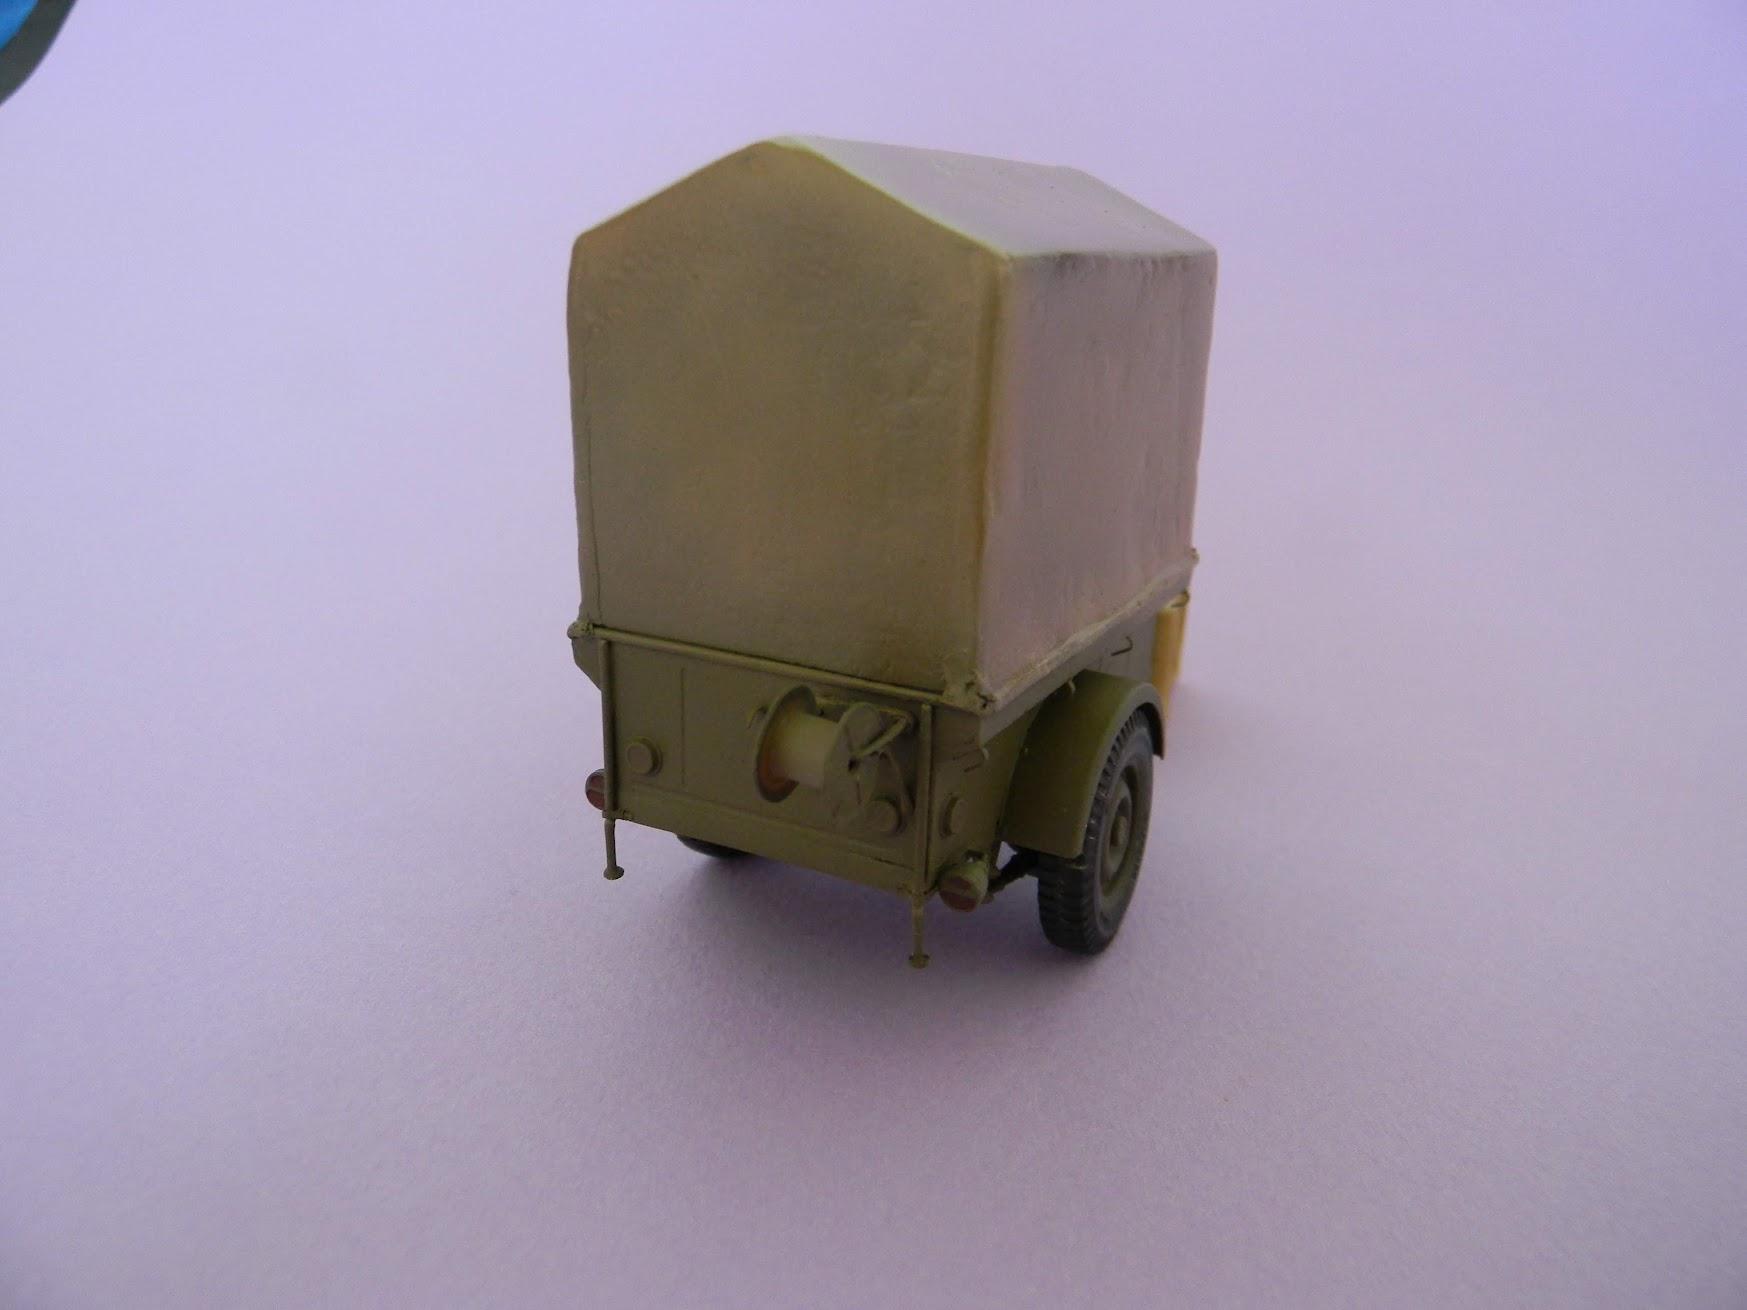 GPW 1942 Ford Bronco Model : revue de détail et montage - Page 5 7MIv0j_hM3F7sAg3Vq0VVZn1lLd8_UwUn0f9DCKkeTvotBriAifWvAk4P_MYSga213wEj53wxBX7fCuKlv2BLyvE2xdkEL6ATNKQ0-b9YZBh1QMfi4BMiEFFg4QQmA8GJqQrn2bffoBK-VtLuxvxzBPq4FlGJT4ibZoaOTtPJuYpqTqdzvv6A1MeEFyQxWKHhg48K7VmN4vpSs4T08mOHCMJHdMVyycjuZ4Hx7cjxuES4FpDHTeCNRH4sOIEEXKr2L7vLBhZutG4pVNXwX8WHW-y0Pm9METxYQnwD_wfbPaUEZPQOr5P0A1Sze6ZHtZmfCS0bRq_oiAlvn21960JTiQimbZmy9zgVR9eX3CiFtk9YZIu99N_5aNKQ8ktJD5Vq-ywi_0qGQtlPlyvkA1WWFUrnpvZTz7jnmeRBqWALSO3SMfngyu_UrwdYBuaq_xLi3N0JSekRl2uGWbl9QL8g-1oXQKm1ub5L9ZKGgqy1DpRod5EMhcZLdZtciCVlTwodbD1ZyzGVKK8pvXGfdBvaoPoLiM0JSwe5U1hwhiOrX8zWKVYkquaosHr1jXaeEgqhn8C7RsZmFHUq1Yp6mYmkzLAZ79gU2g-H8Z6bIjqHgT24Ov0Sulv0nYvAL0ZivTZa0spWCxQ918O9OZWT2PUcZTa12w7secaSf1mXZna20Y3YjVEBFYXoglo_sql4hXAOc_ZczedfwAyMo-9VXakQodfGQBkV9EH4Z9gFz5sOPN7jd3NwQ=w1747-h1310-no